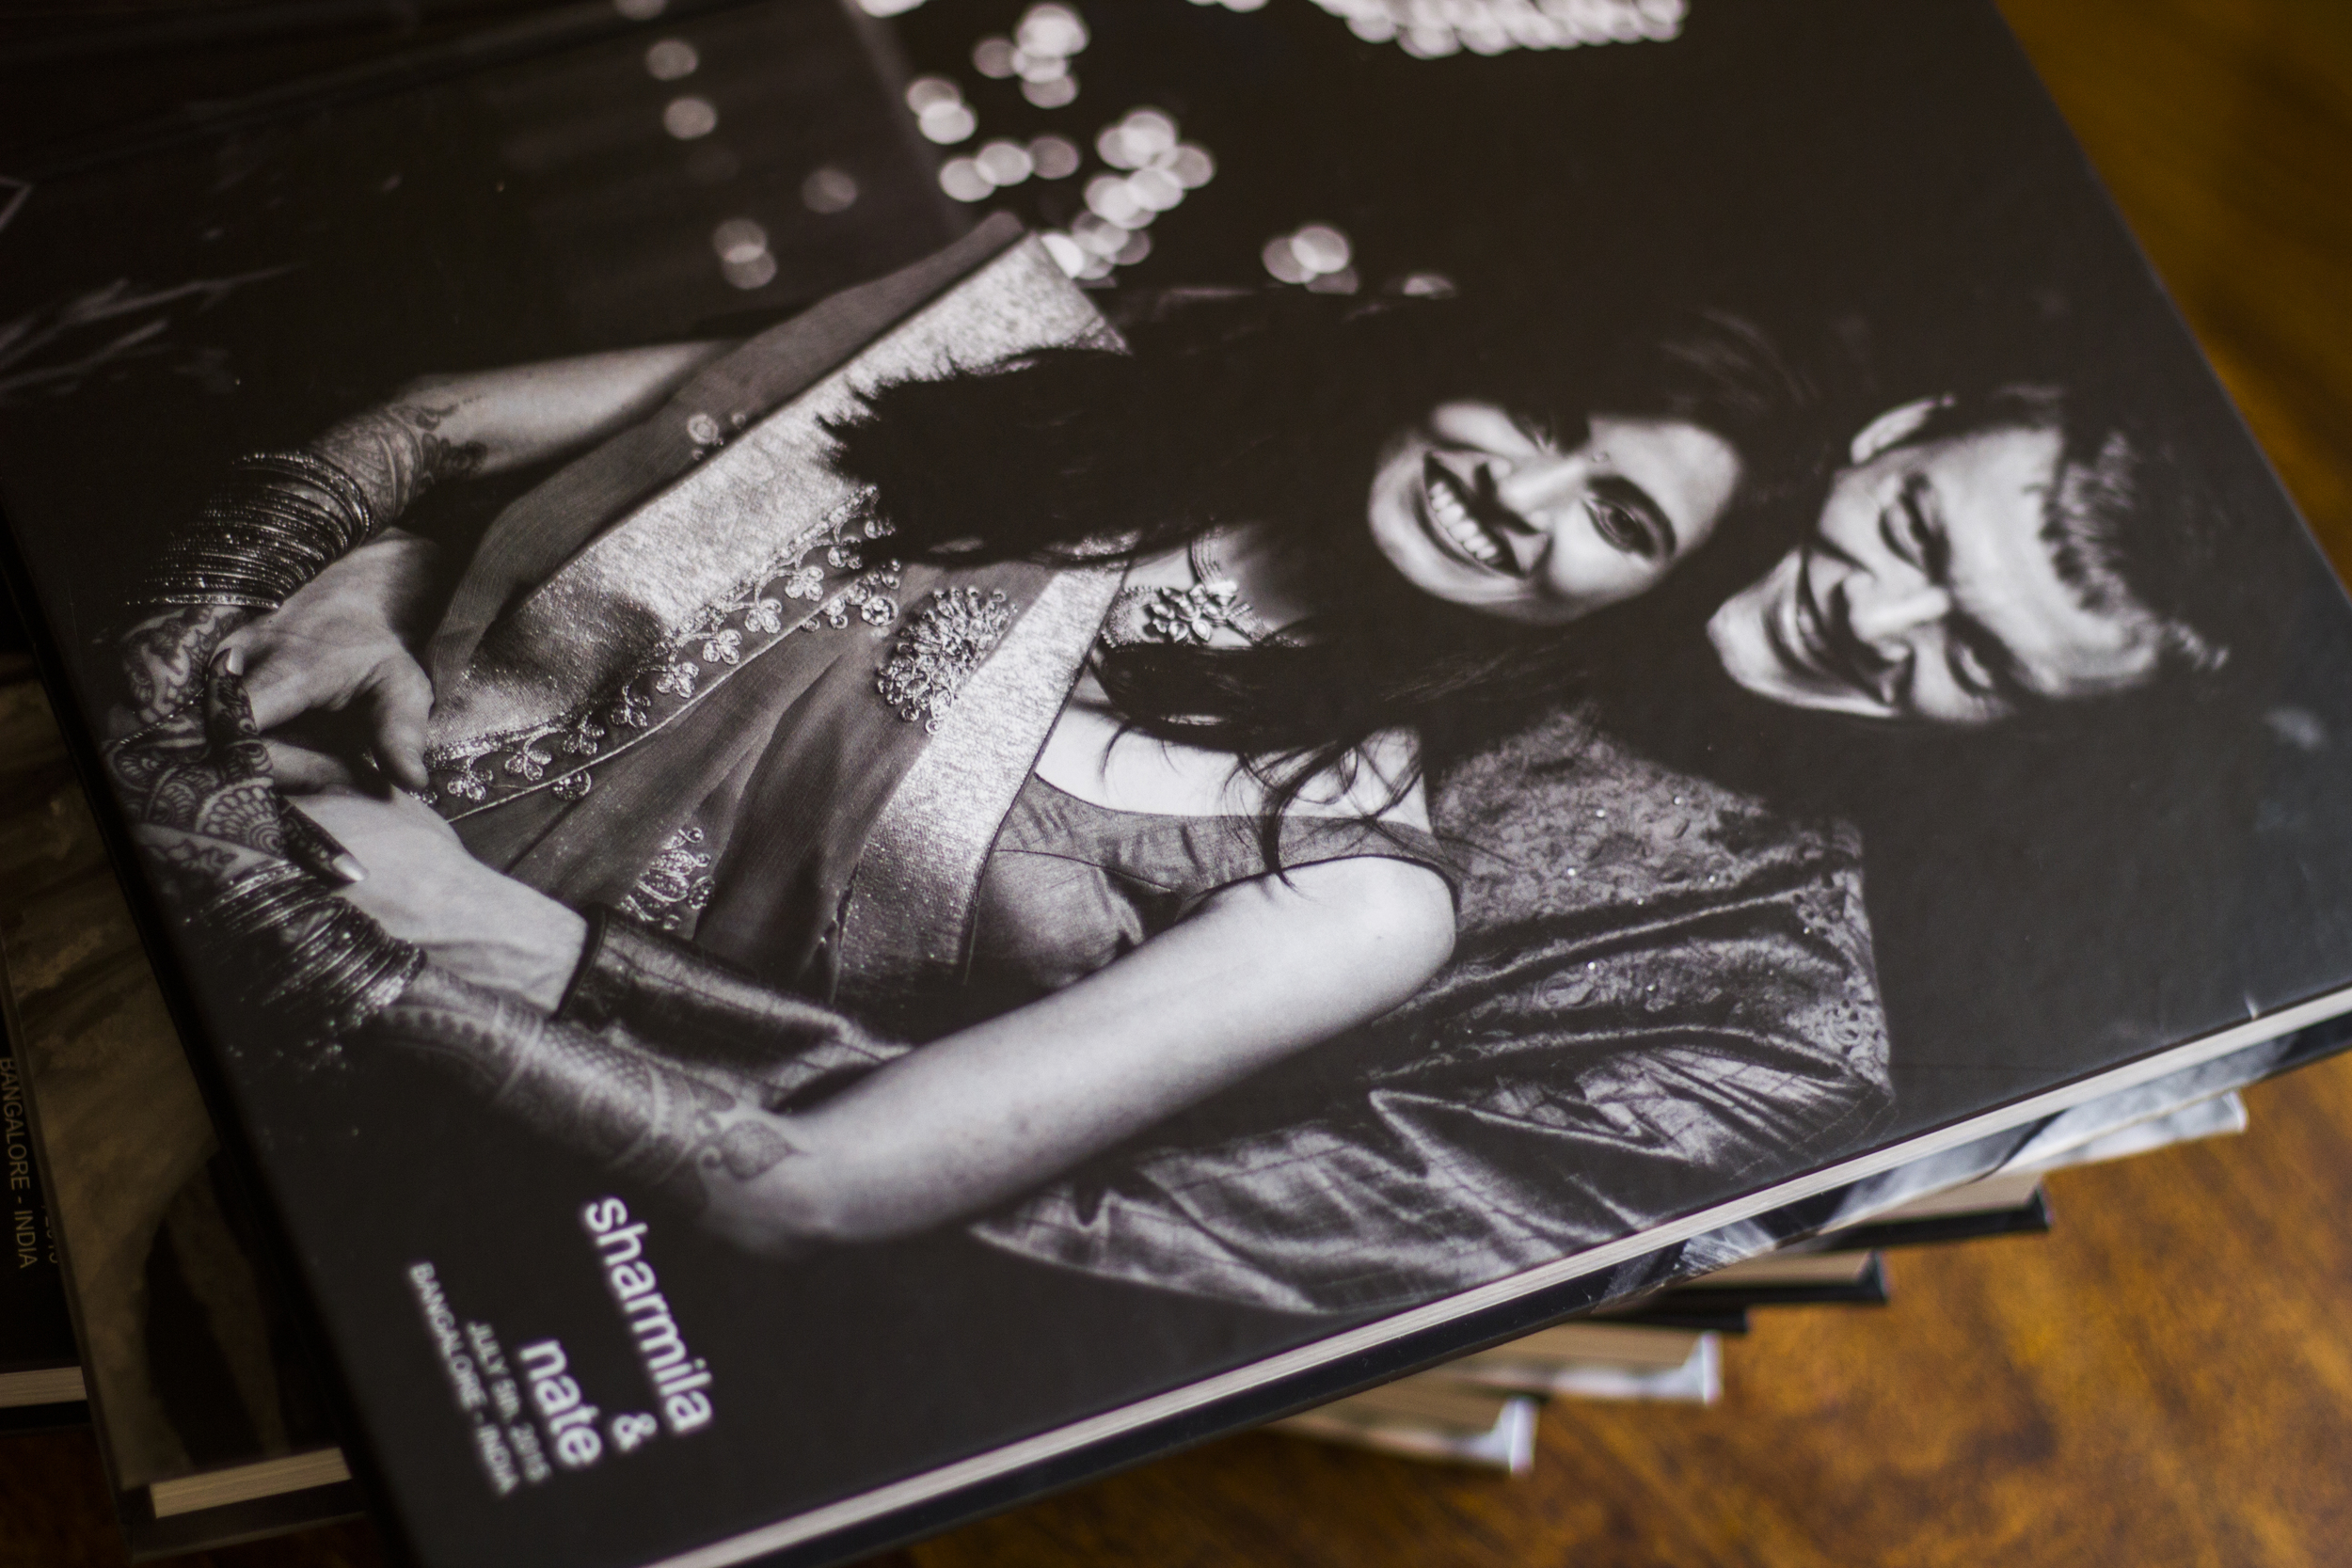 jude_lazaro_weddings_bangalore_india_Photo Book_NRI_Hindu_Muslim_Christian_Candid__1.jpg